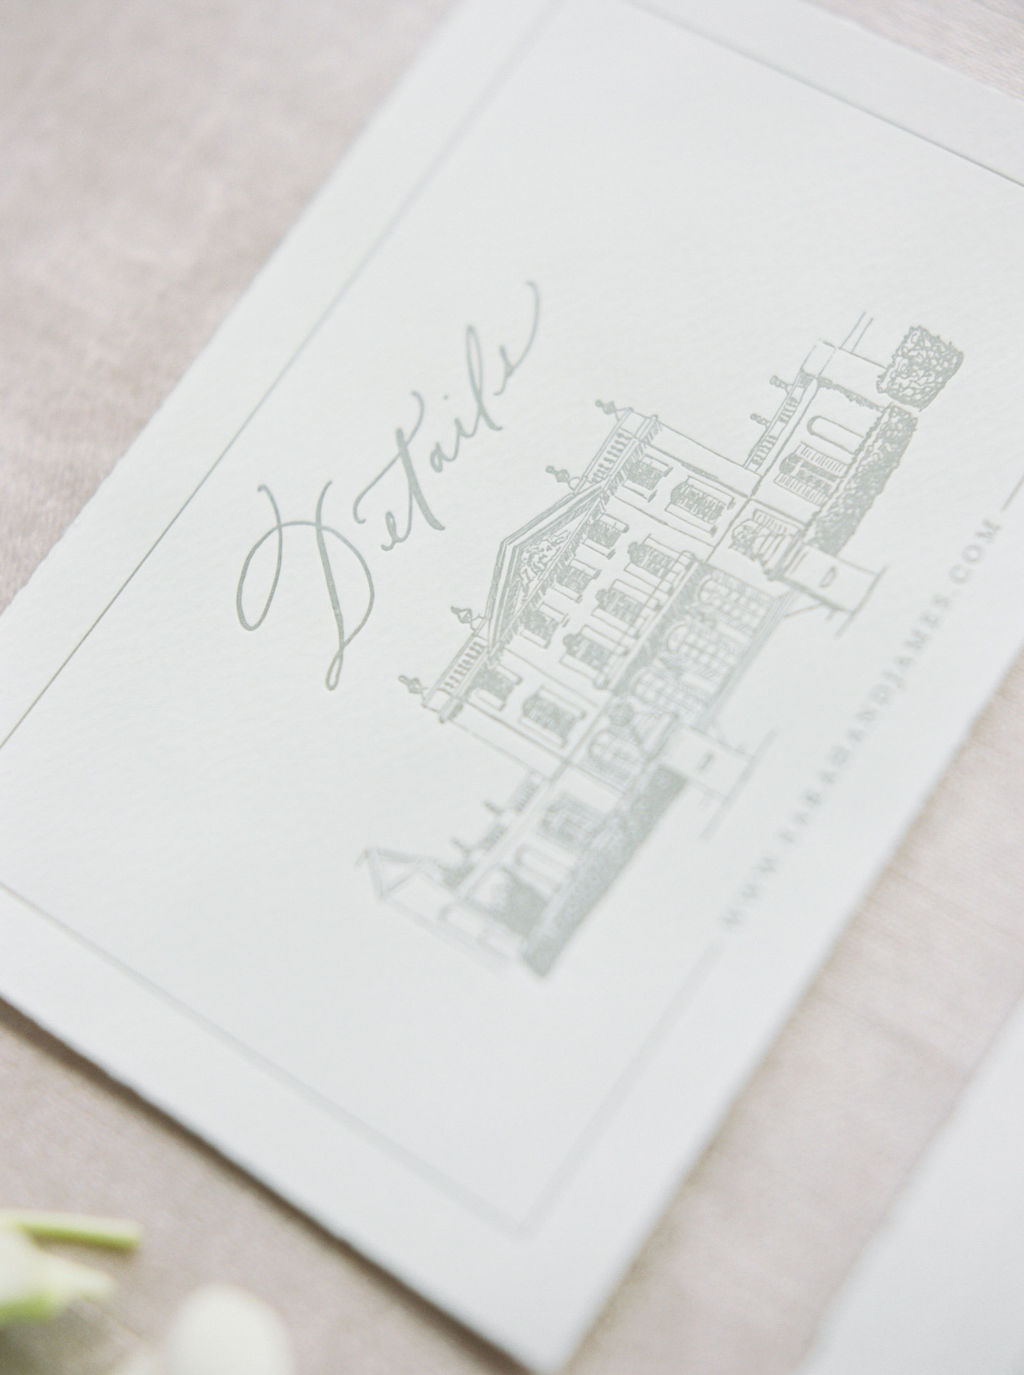 Letterpress printing for wedding invitations.